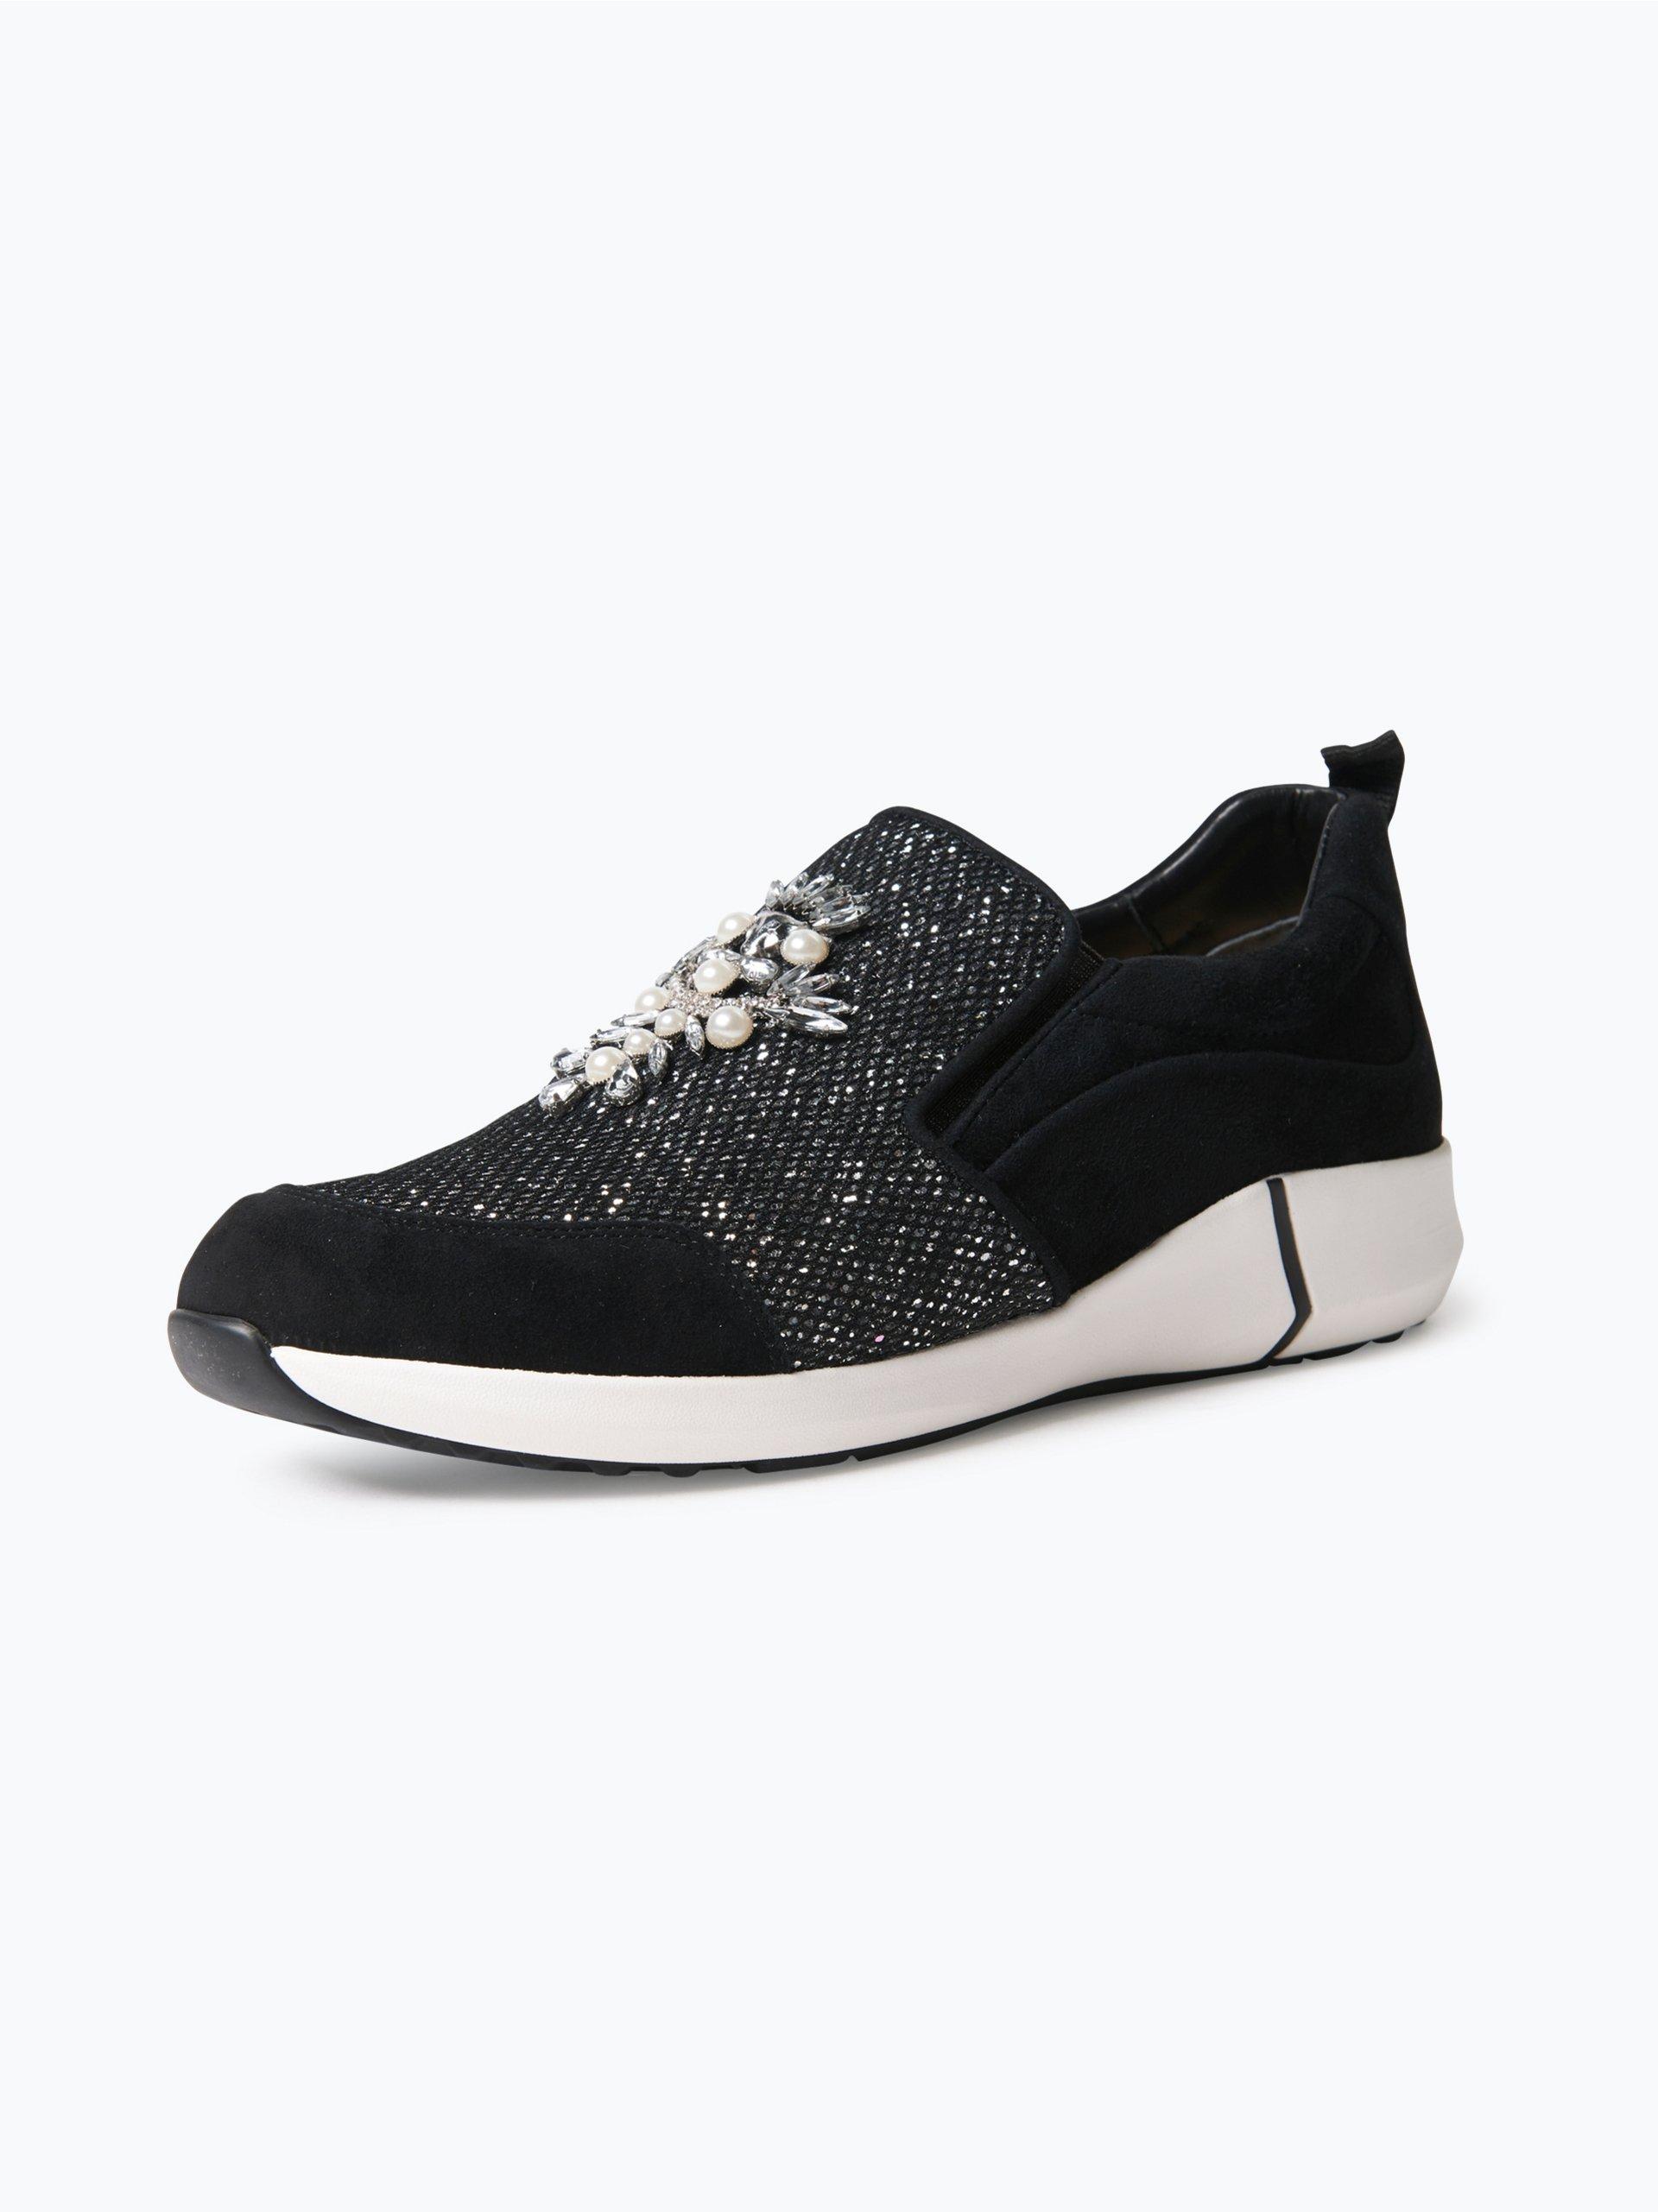 marc cain bags shoes damen sneaker aus leder schwarz gemustert online kaufen vangraaf com. Black Bedroom Furniture Sets. Home Design Ideas